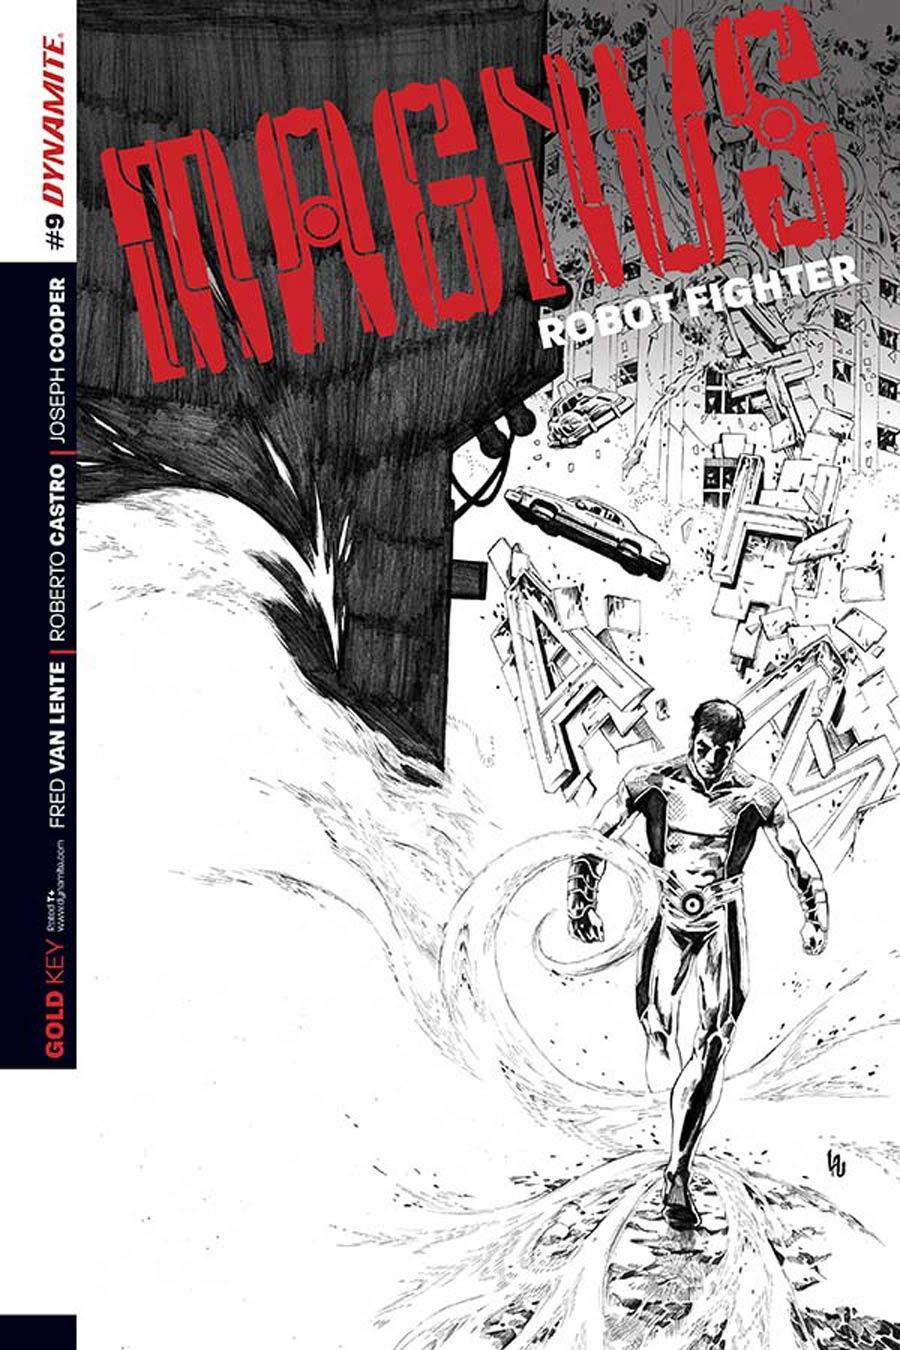 Magnus Robot Fighter Vol 4 #9 Cover C Incentive Jonathan Lau Black & White Cover